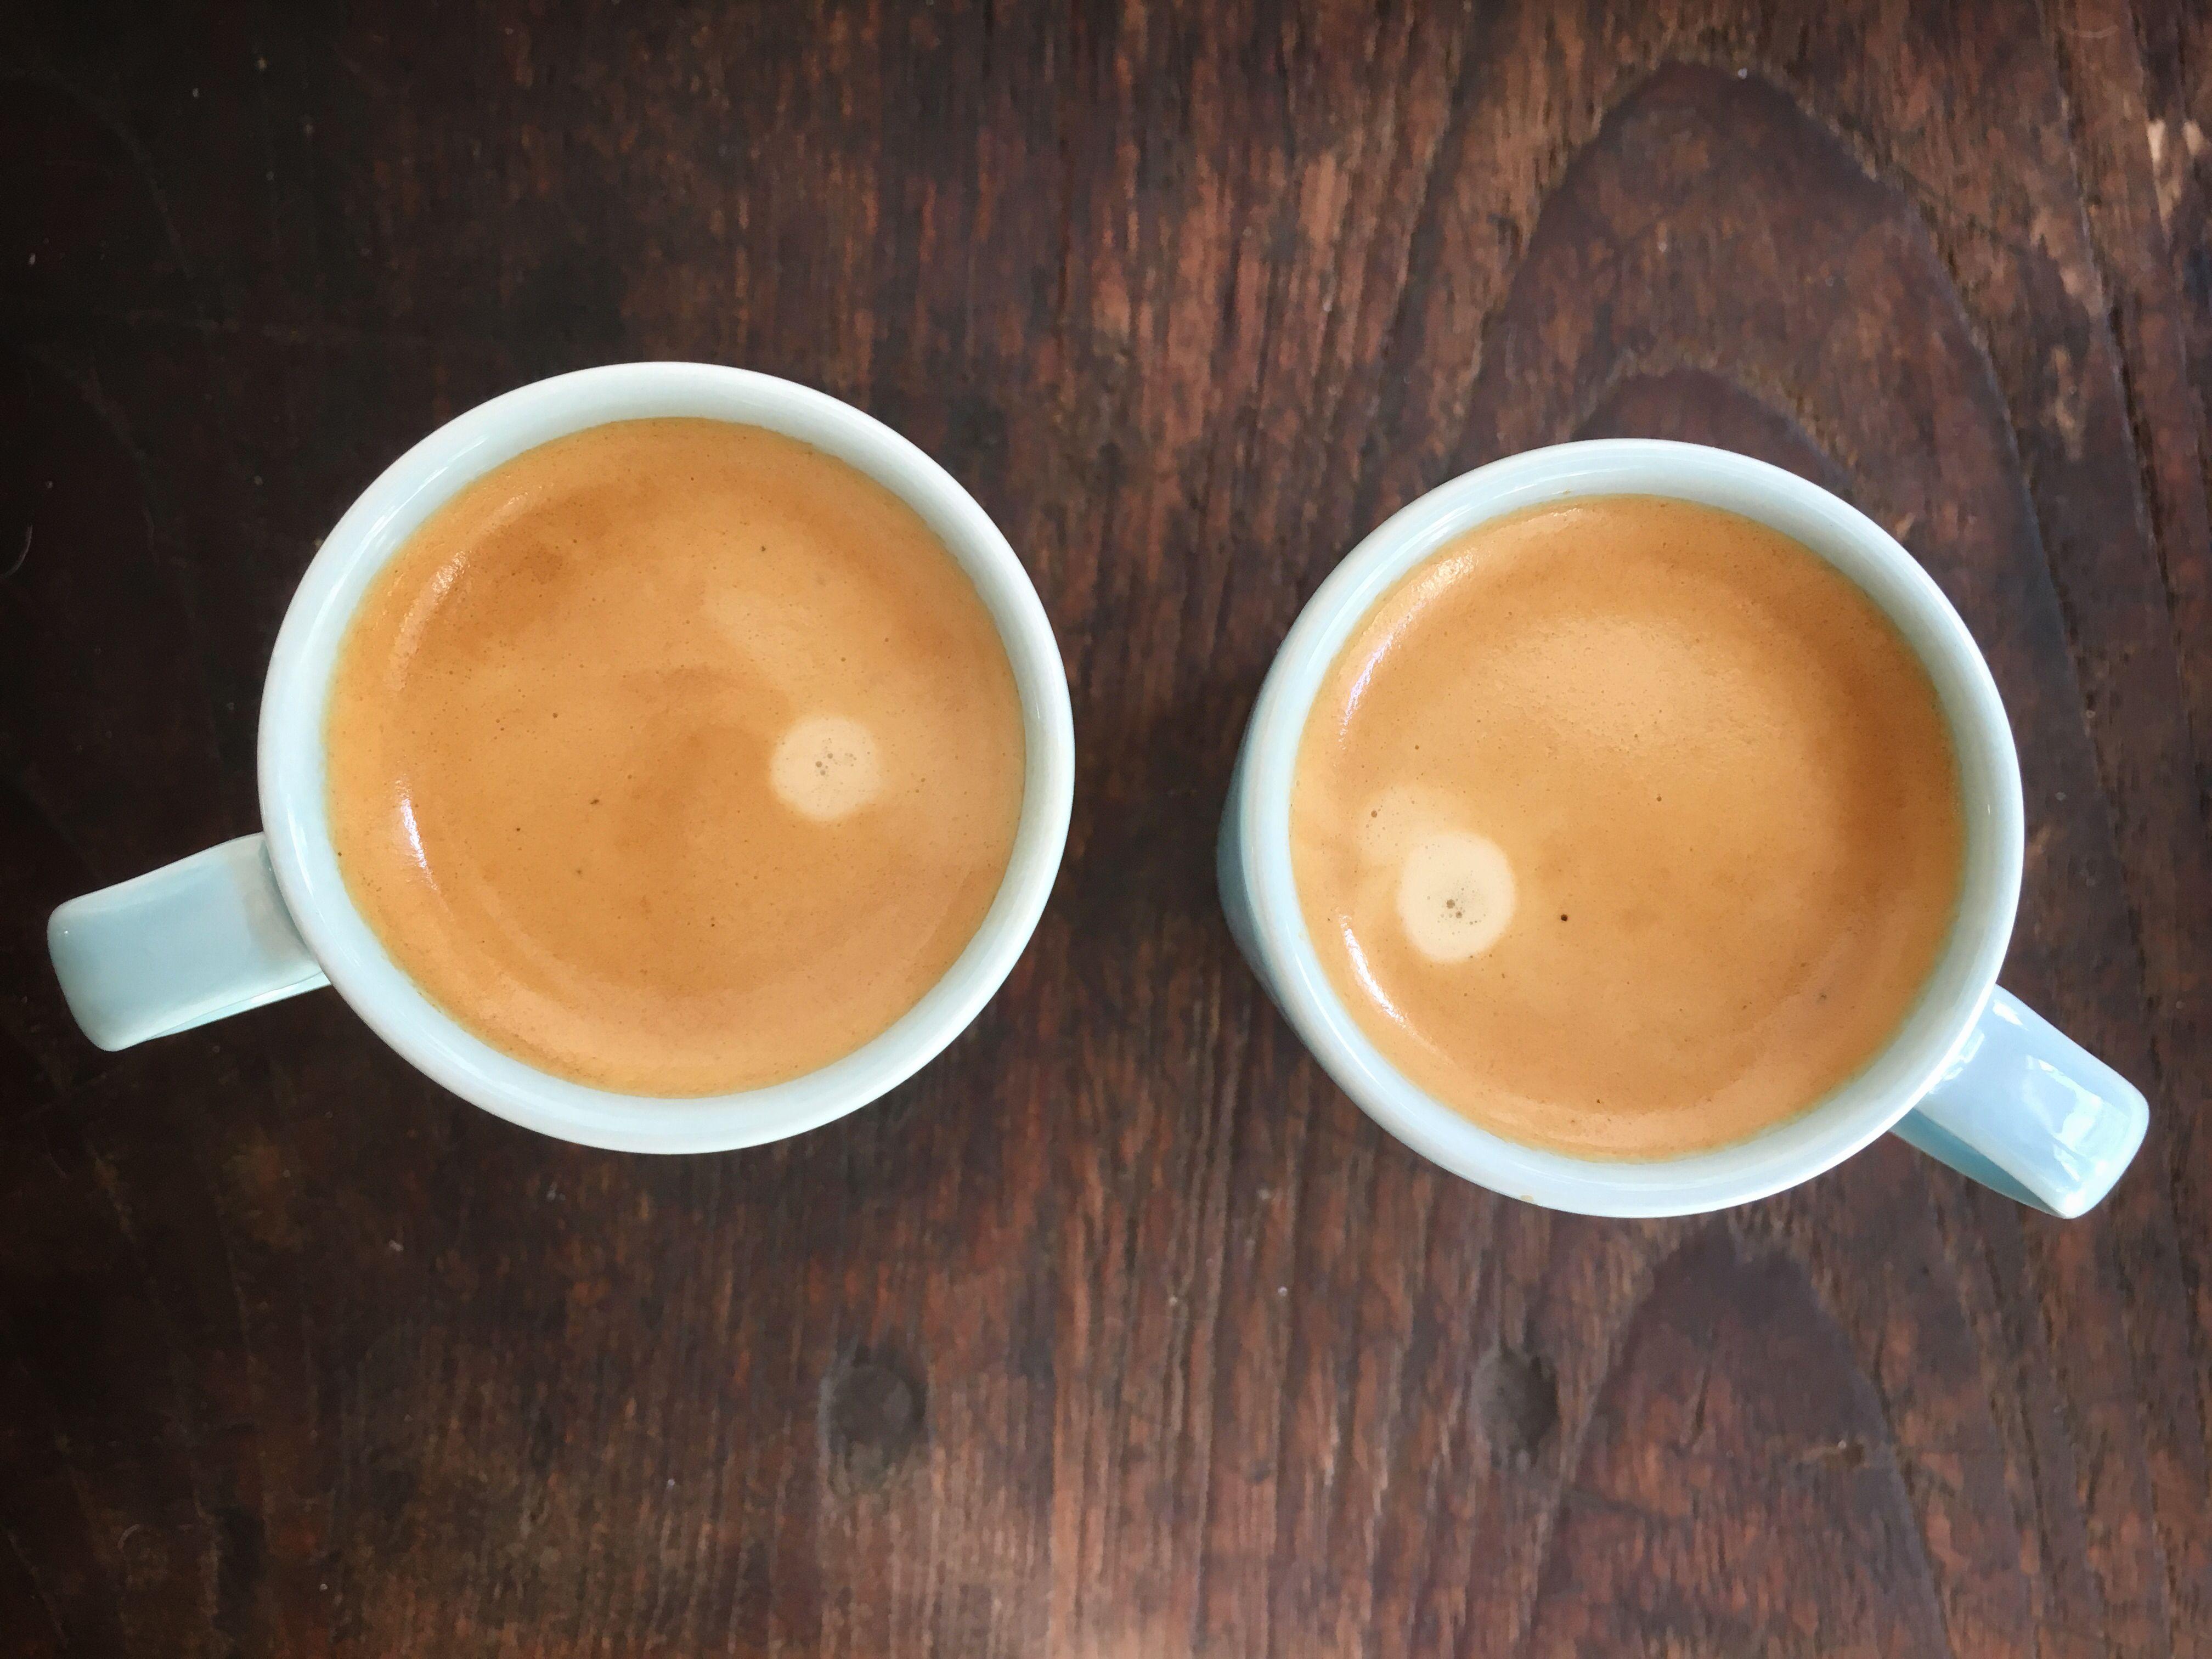 The 8 Best Espresso Machines to Buy in 2018